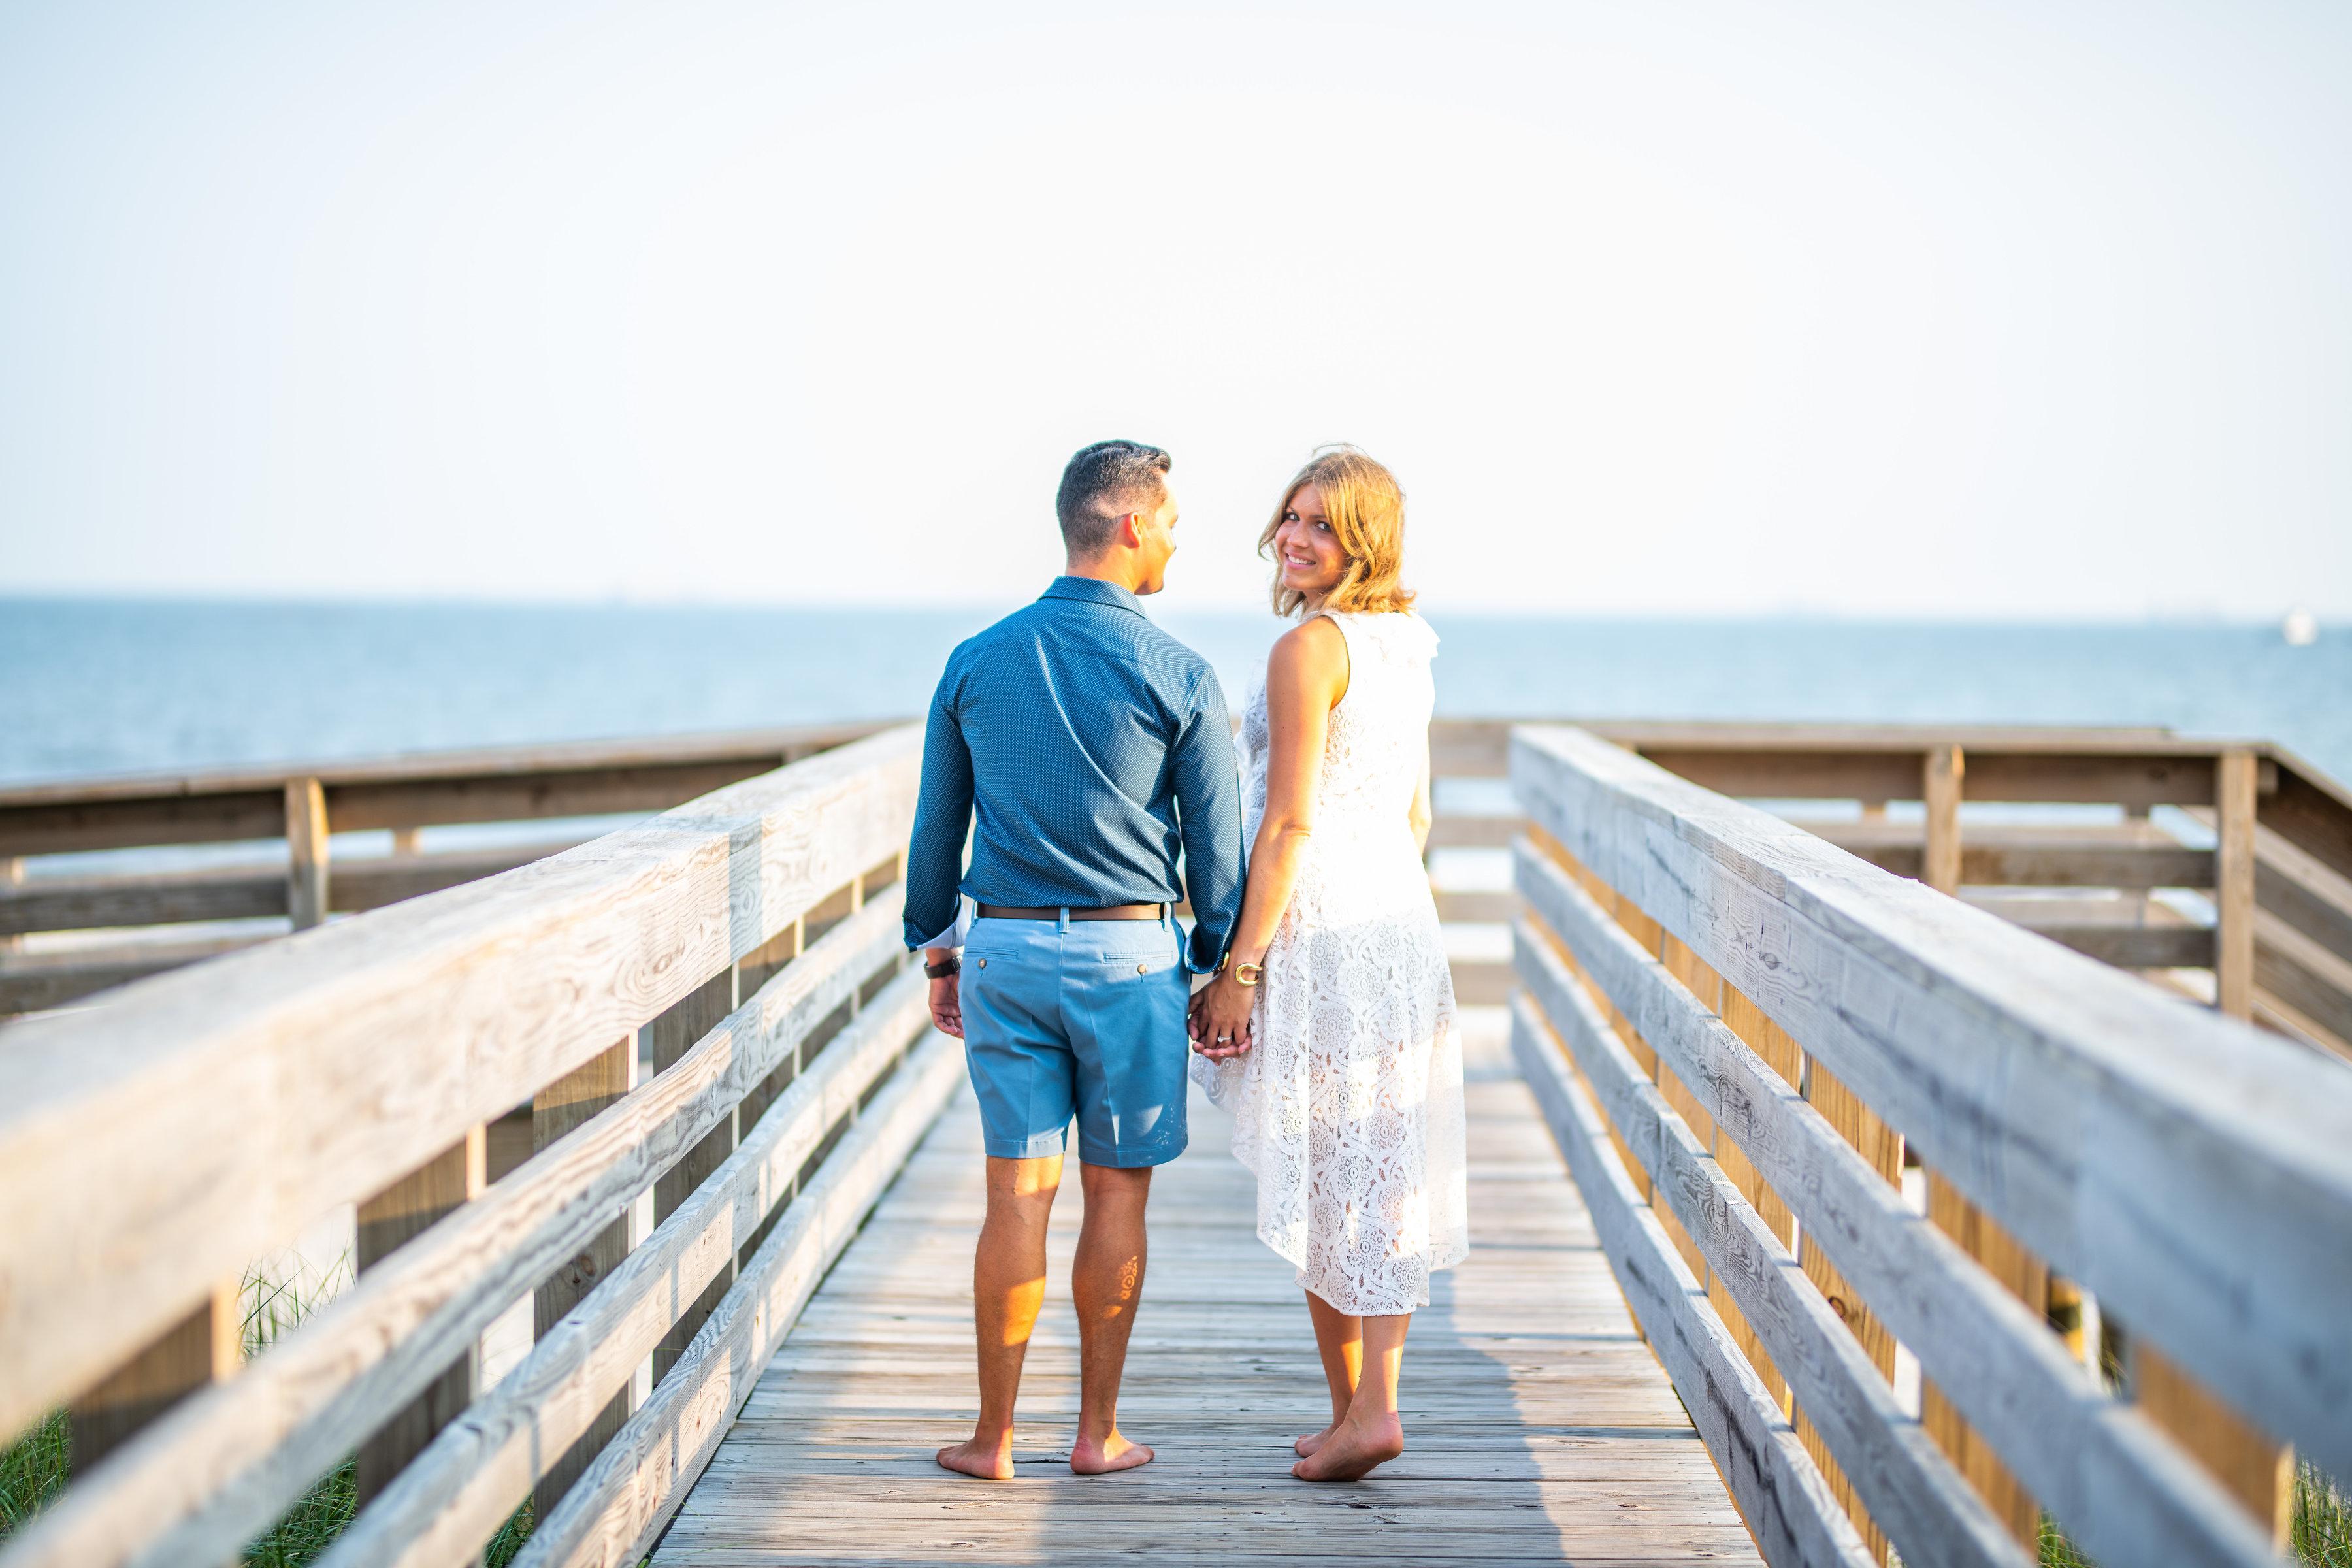 Long Beach NY Engagement Shoot | Long Beach Boardwalk Engagement Shoot | Long Island Wedding Photographer 11